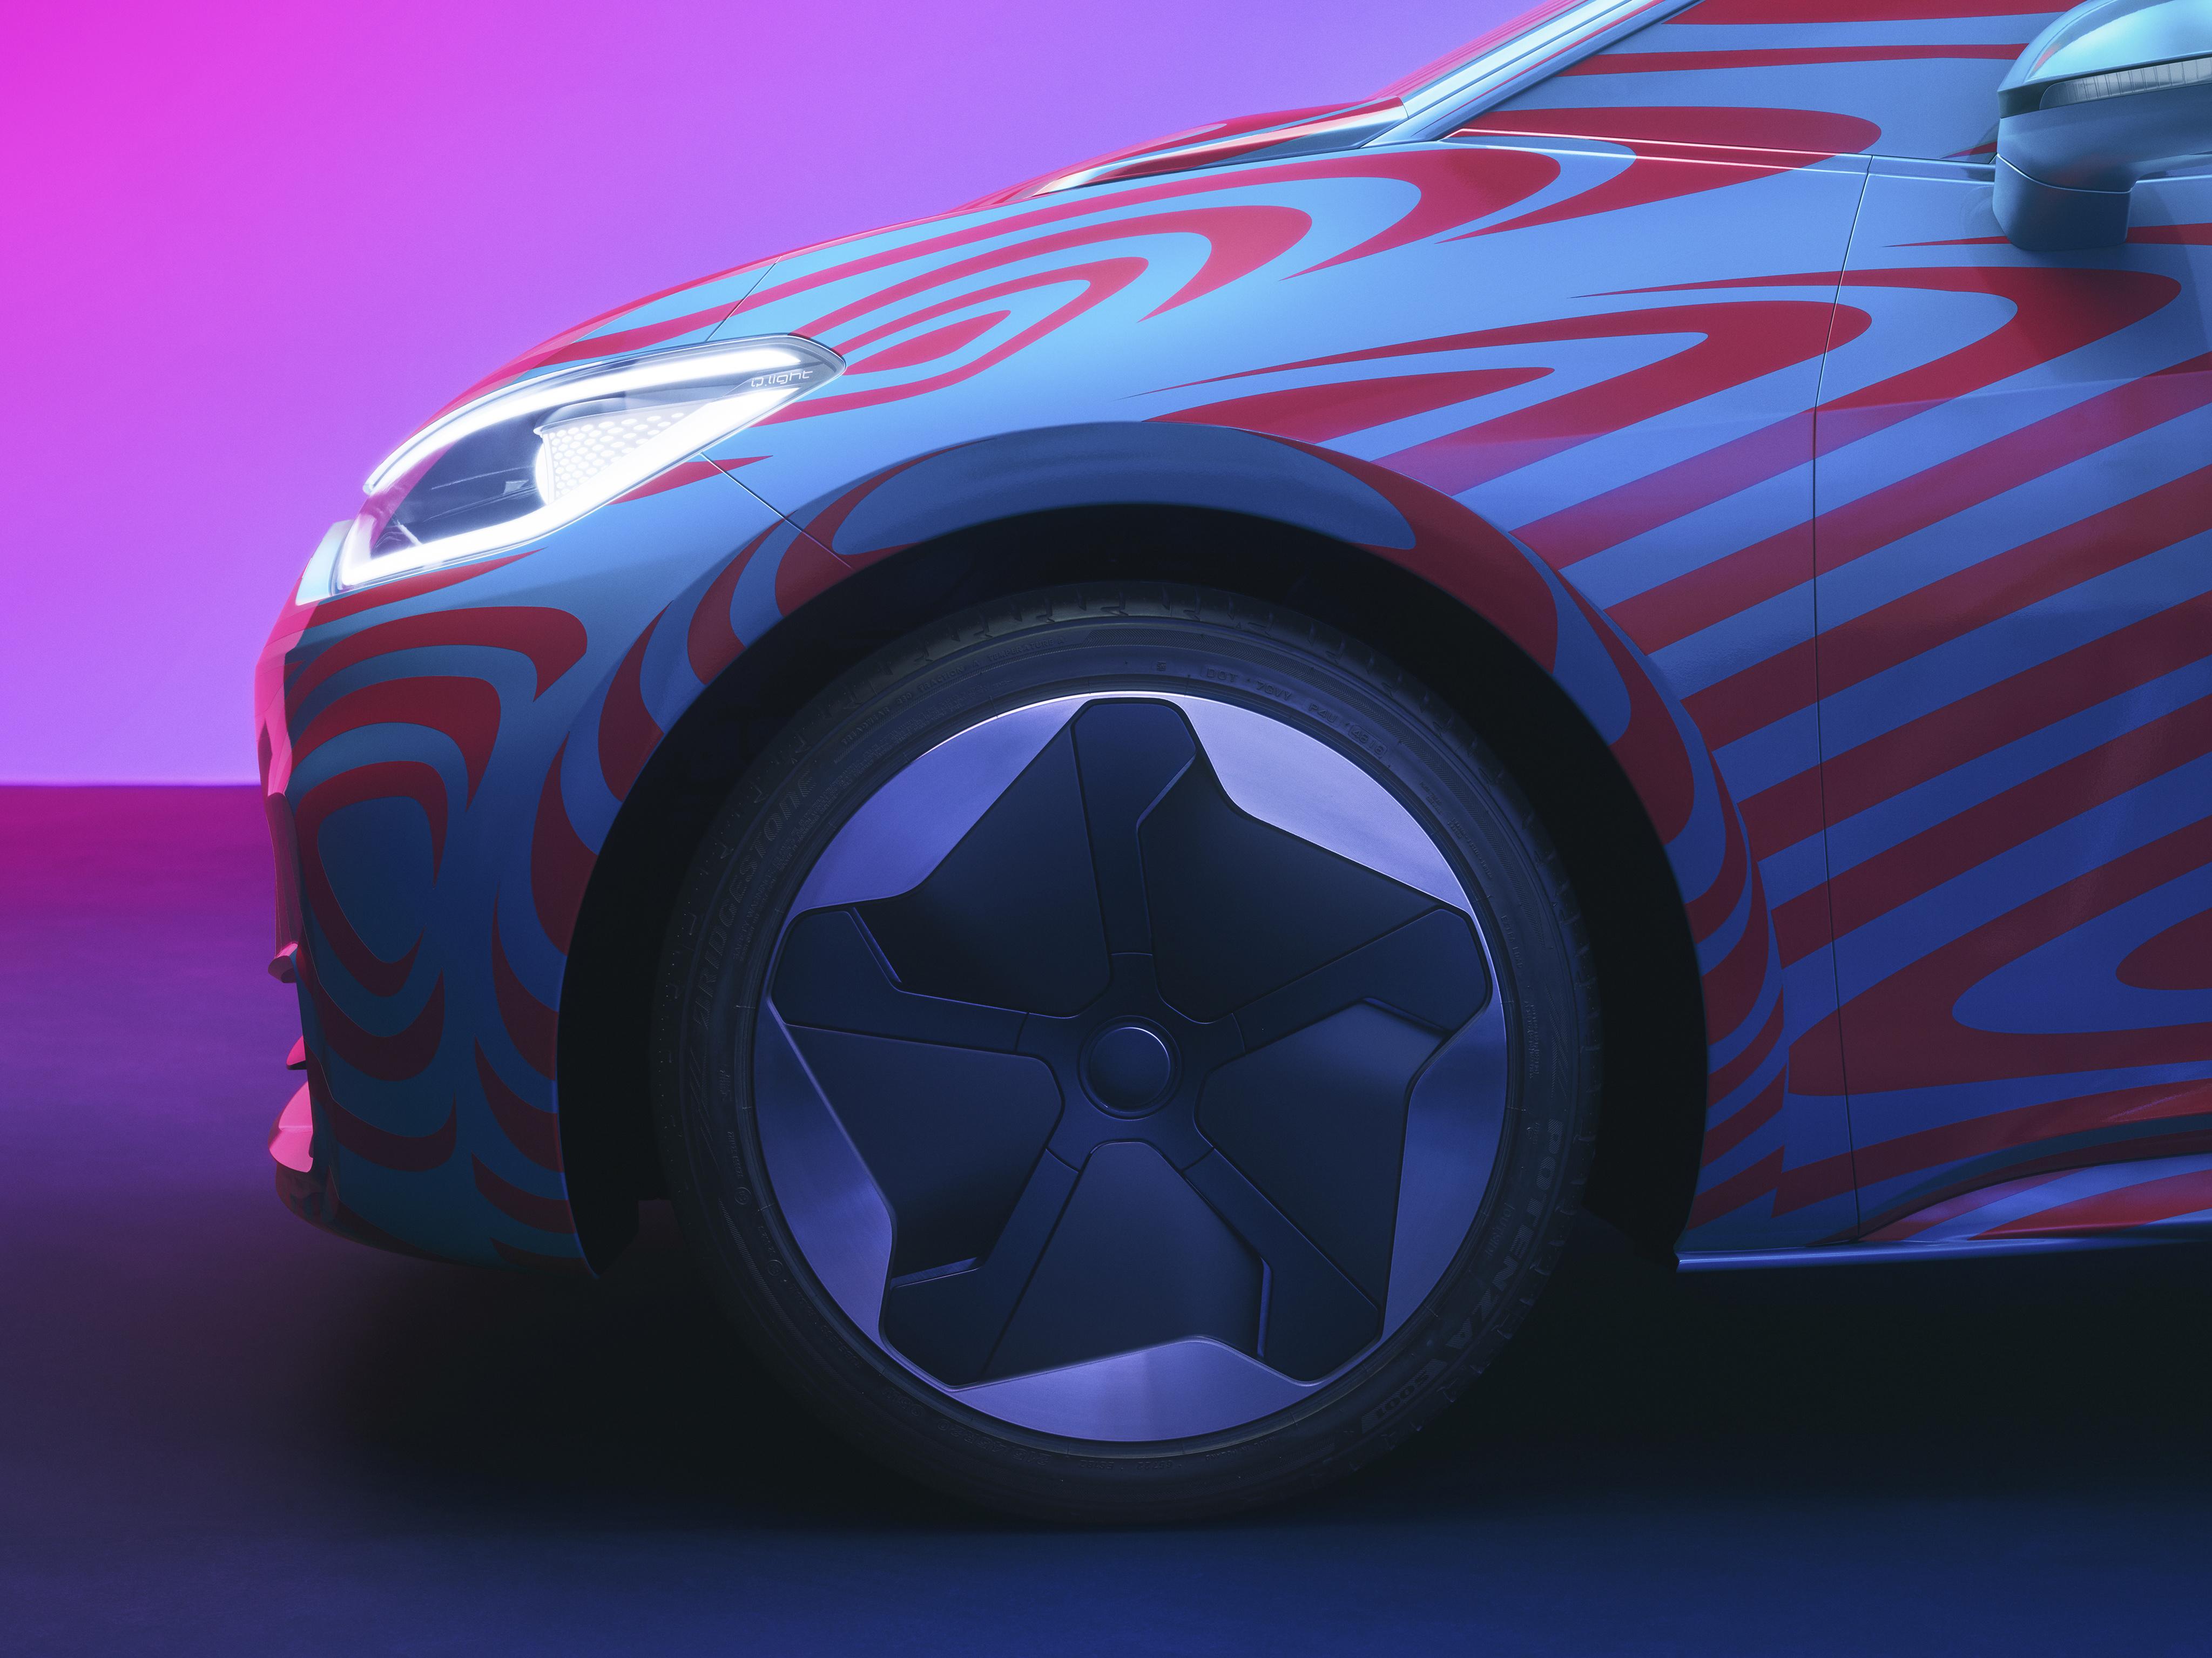 especial_emobility-autobild